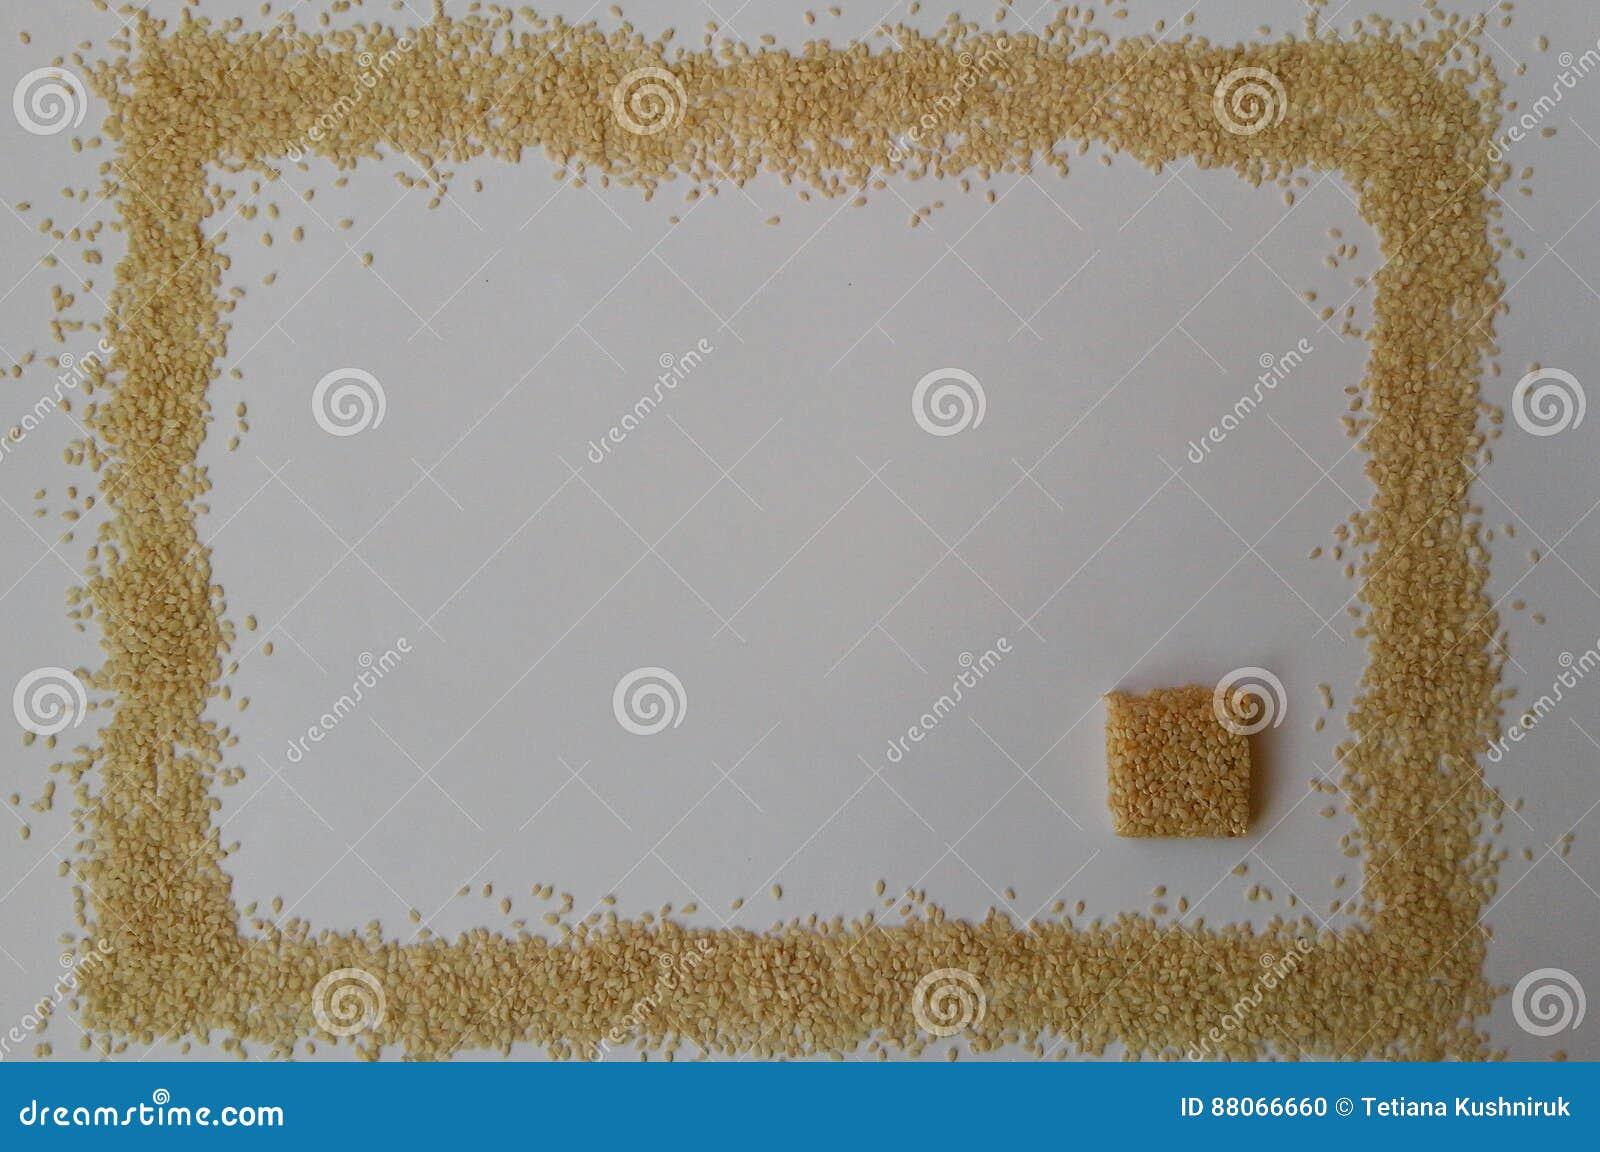 Sementes de sésamo no fundo branco doces doces do sésamo textura clara Vista superior Isolado no branco Alimento naughty